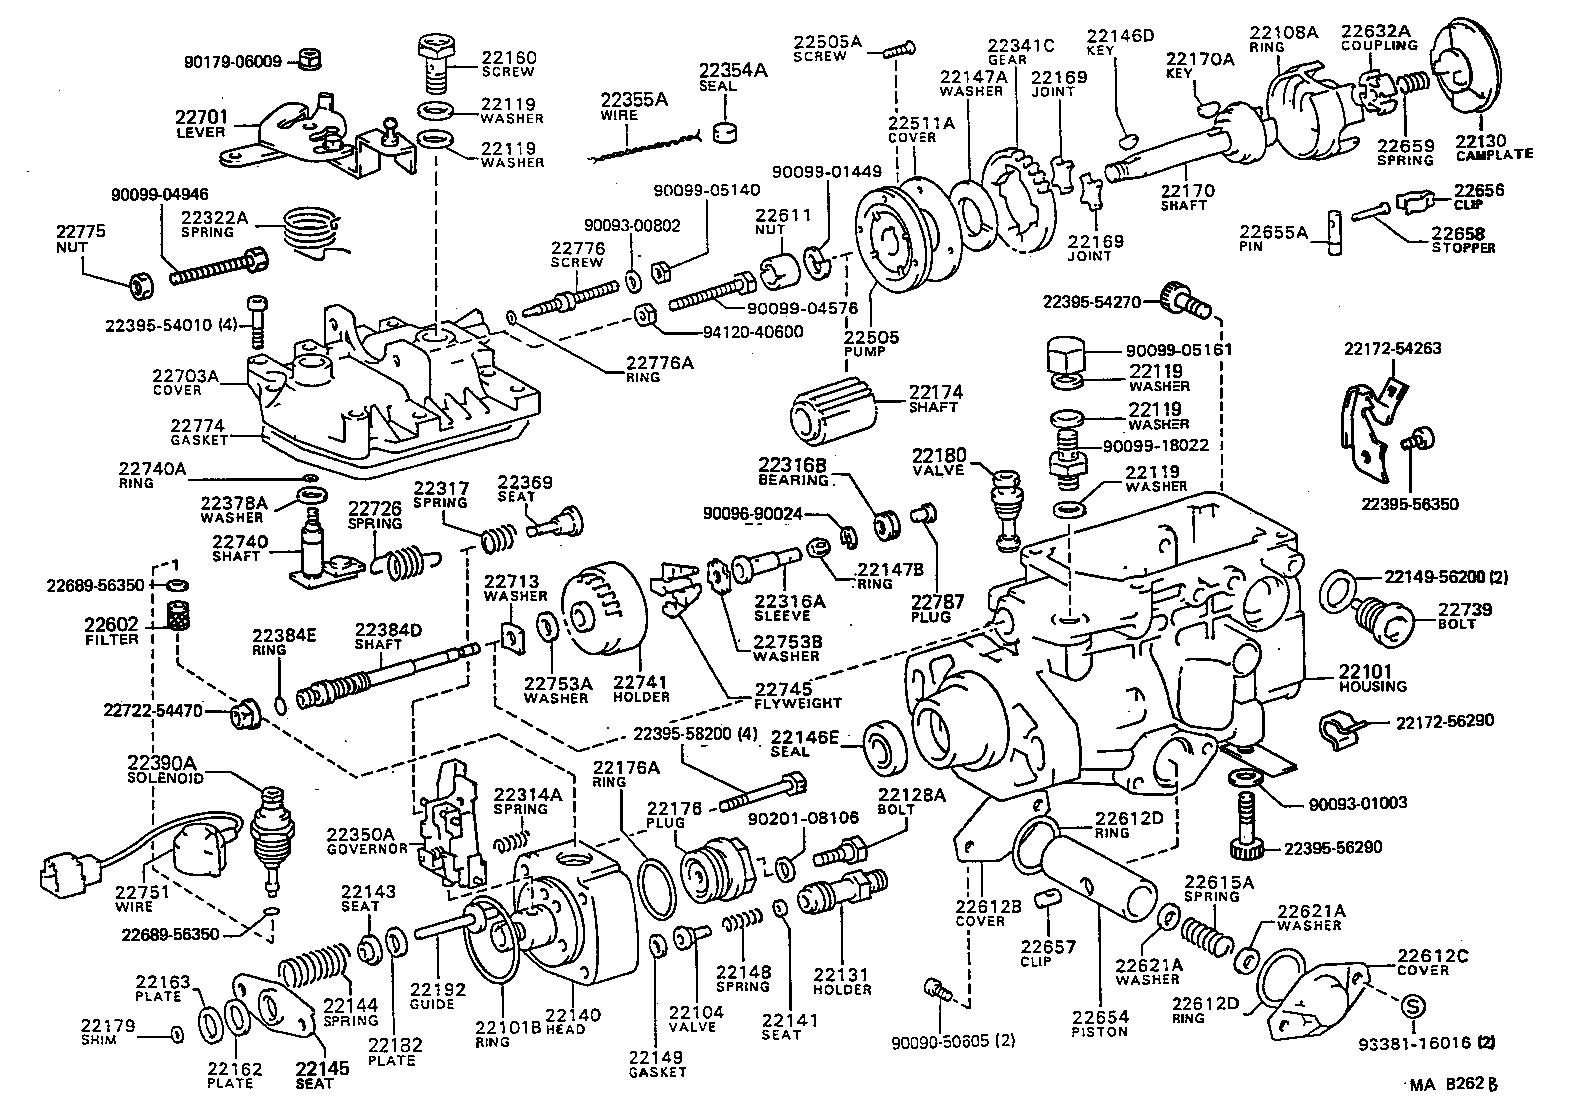 TOYOTA LAND CRUISER 70BJ73R-KR - TOOL-ENGINE-FUEL ...